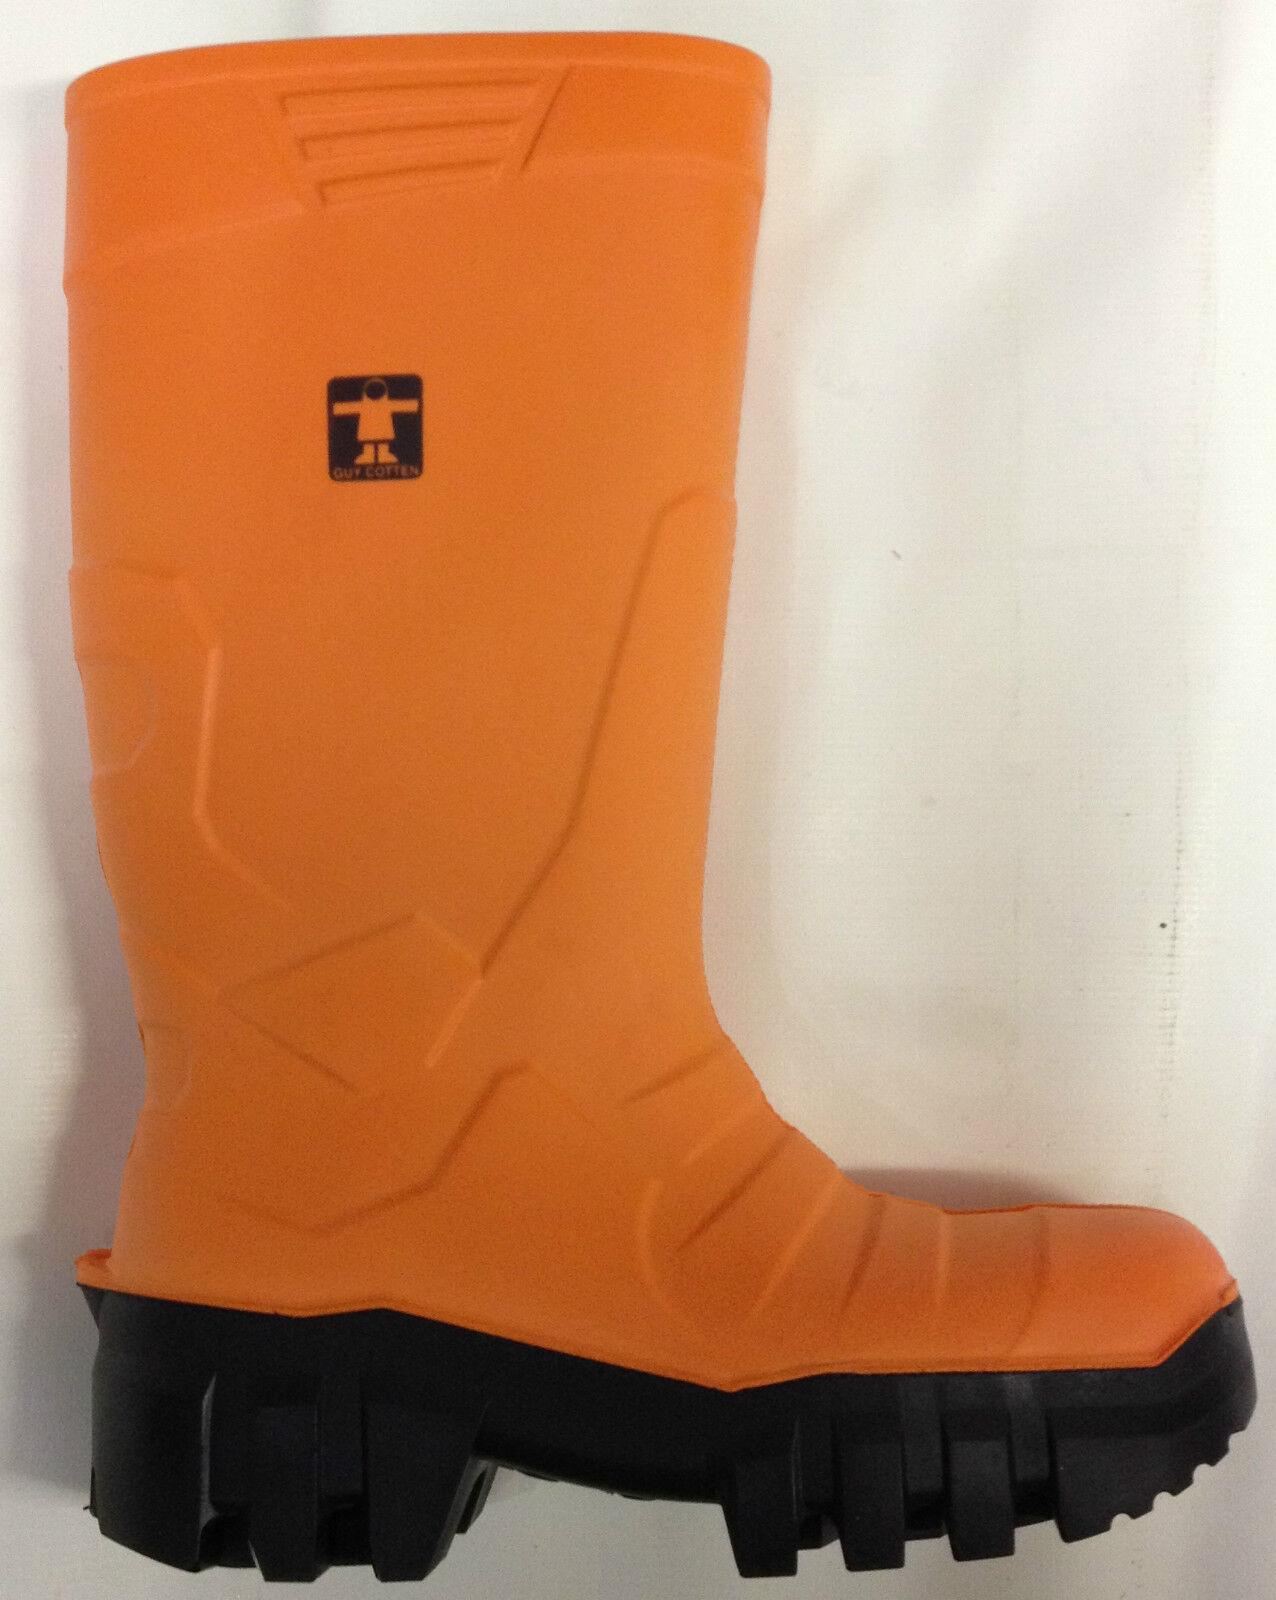 Guy Cotten Thermo botas De Seguridad Naranja Toe